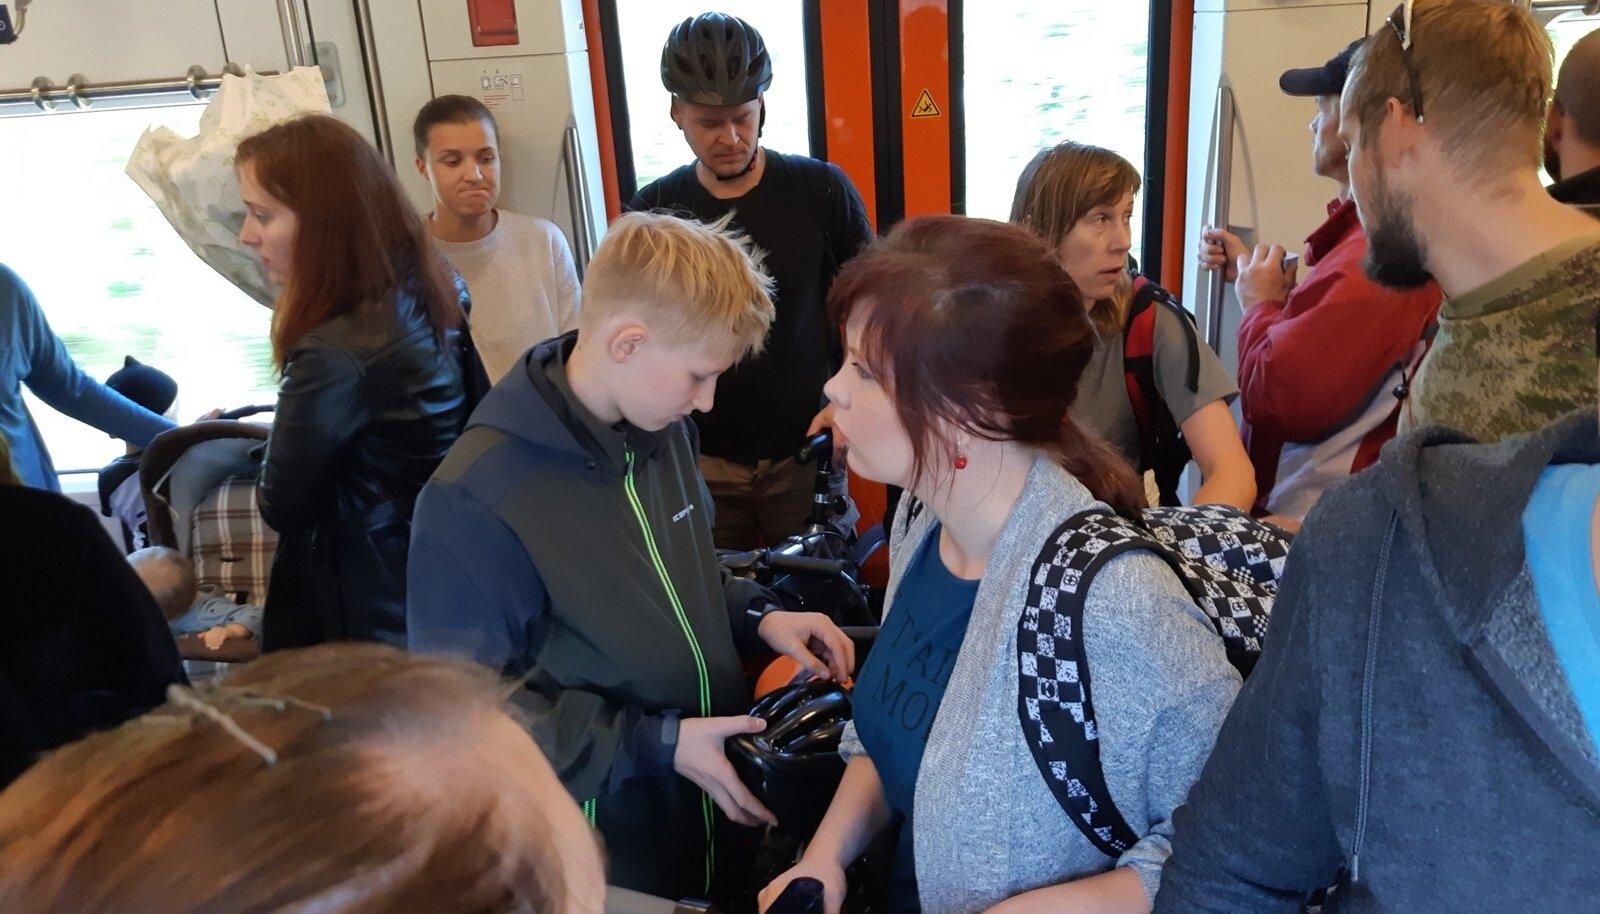 Jalgrattauputus Tallinna–Viljandi rongis